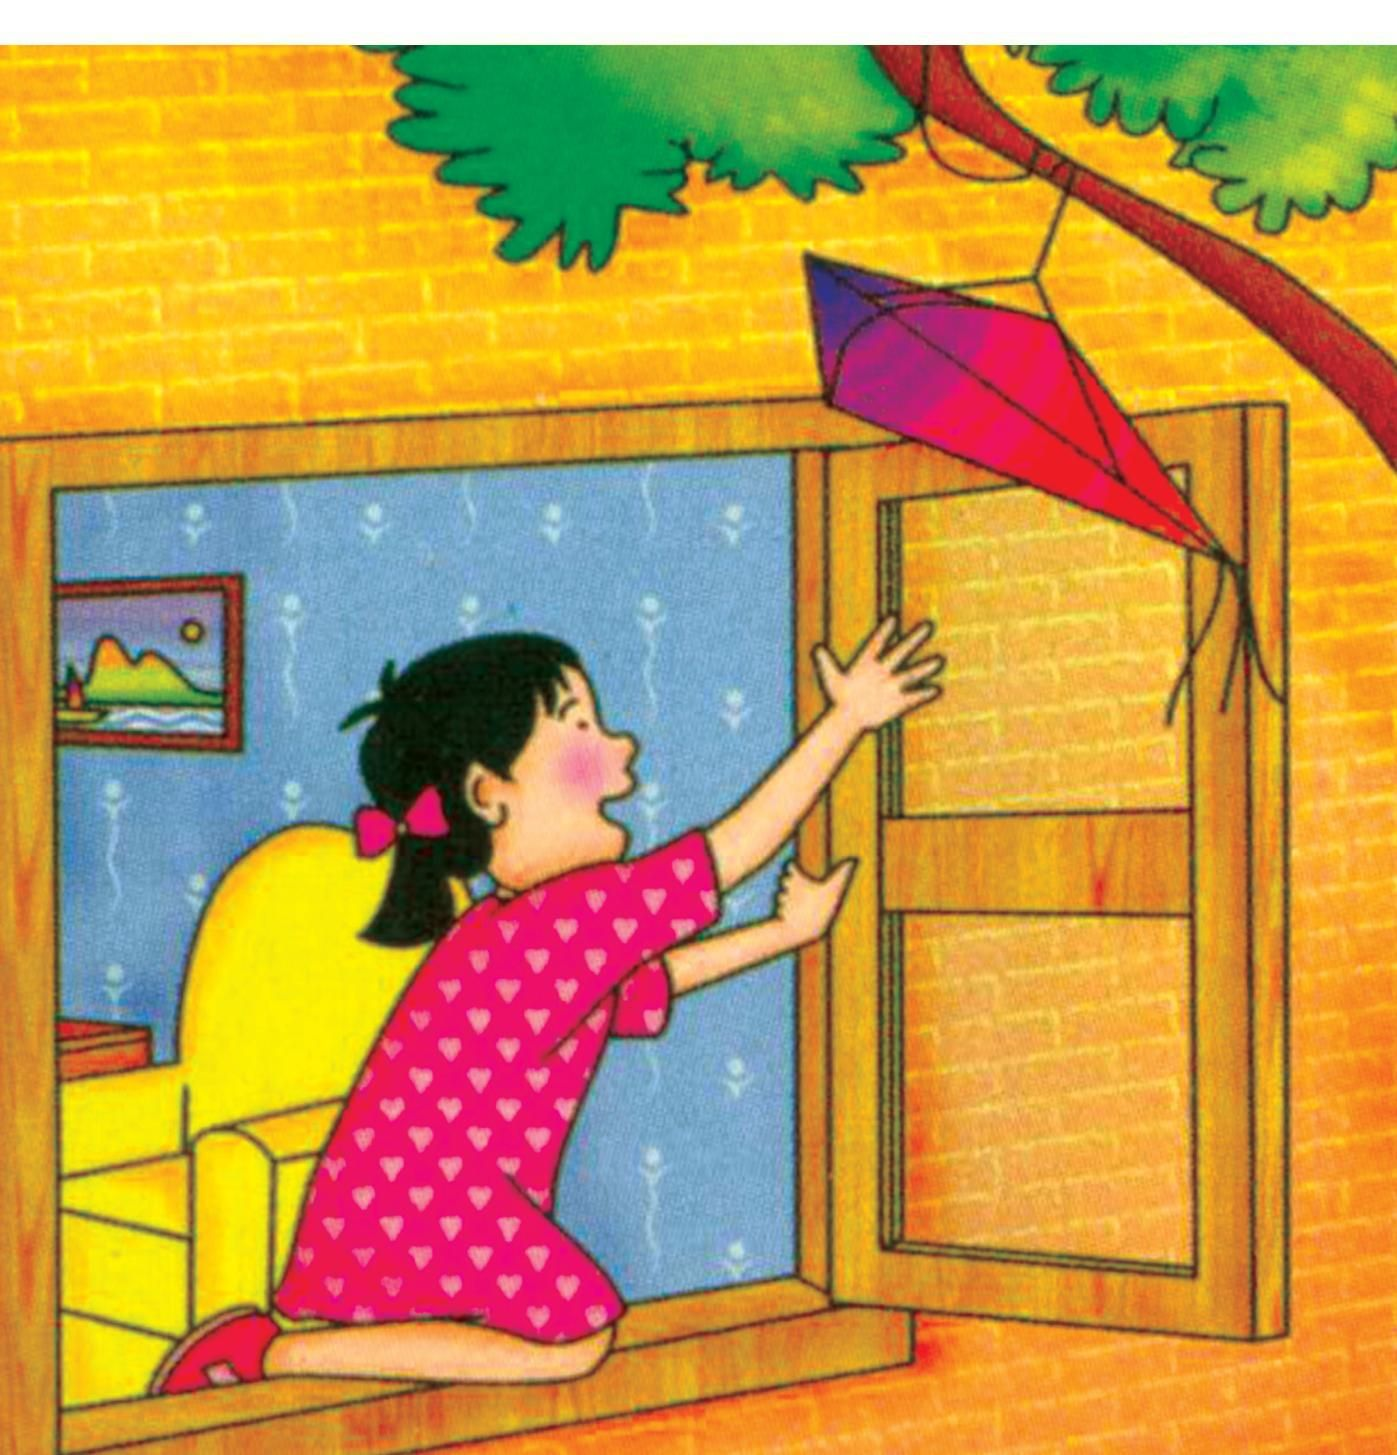 Do Not Climb On To Window Sills